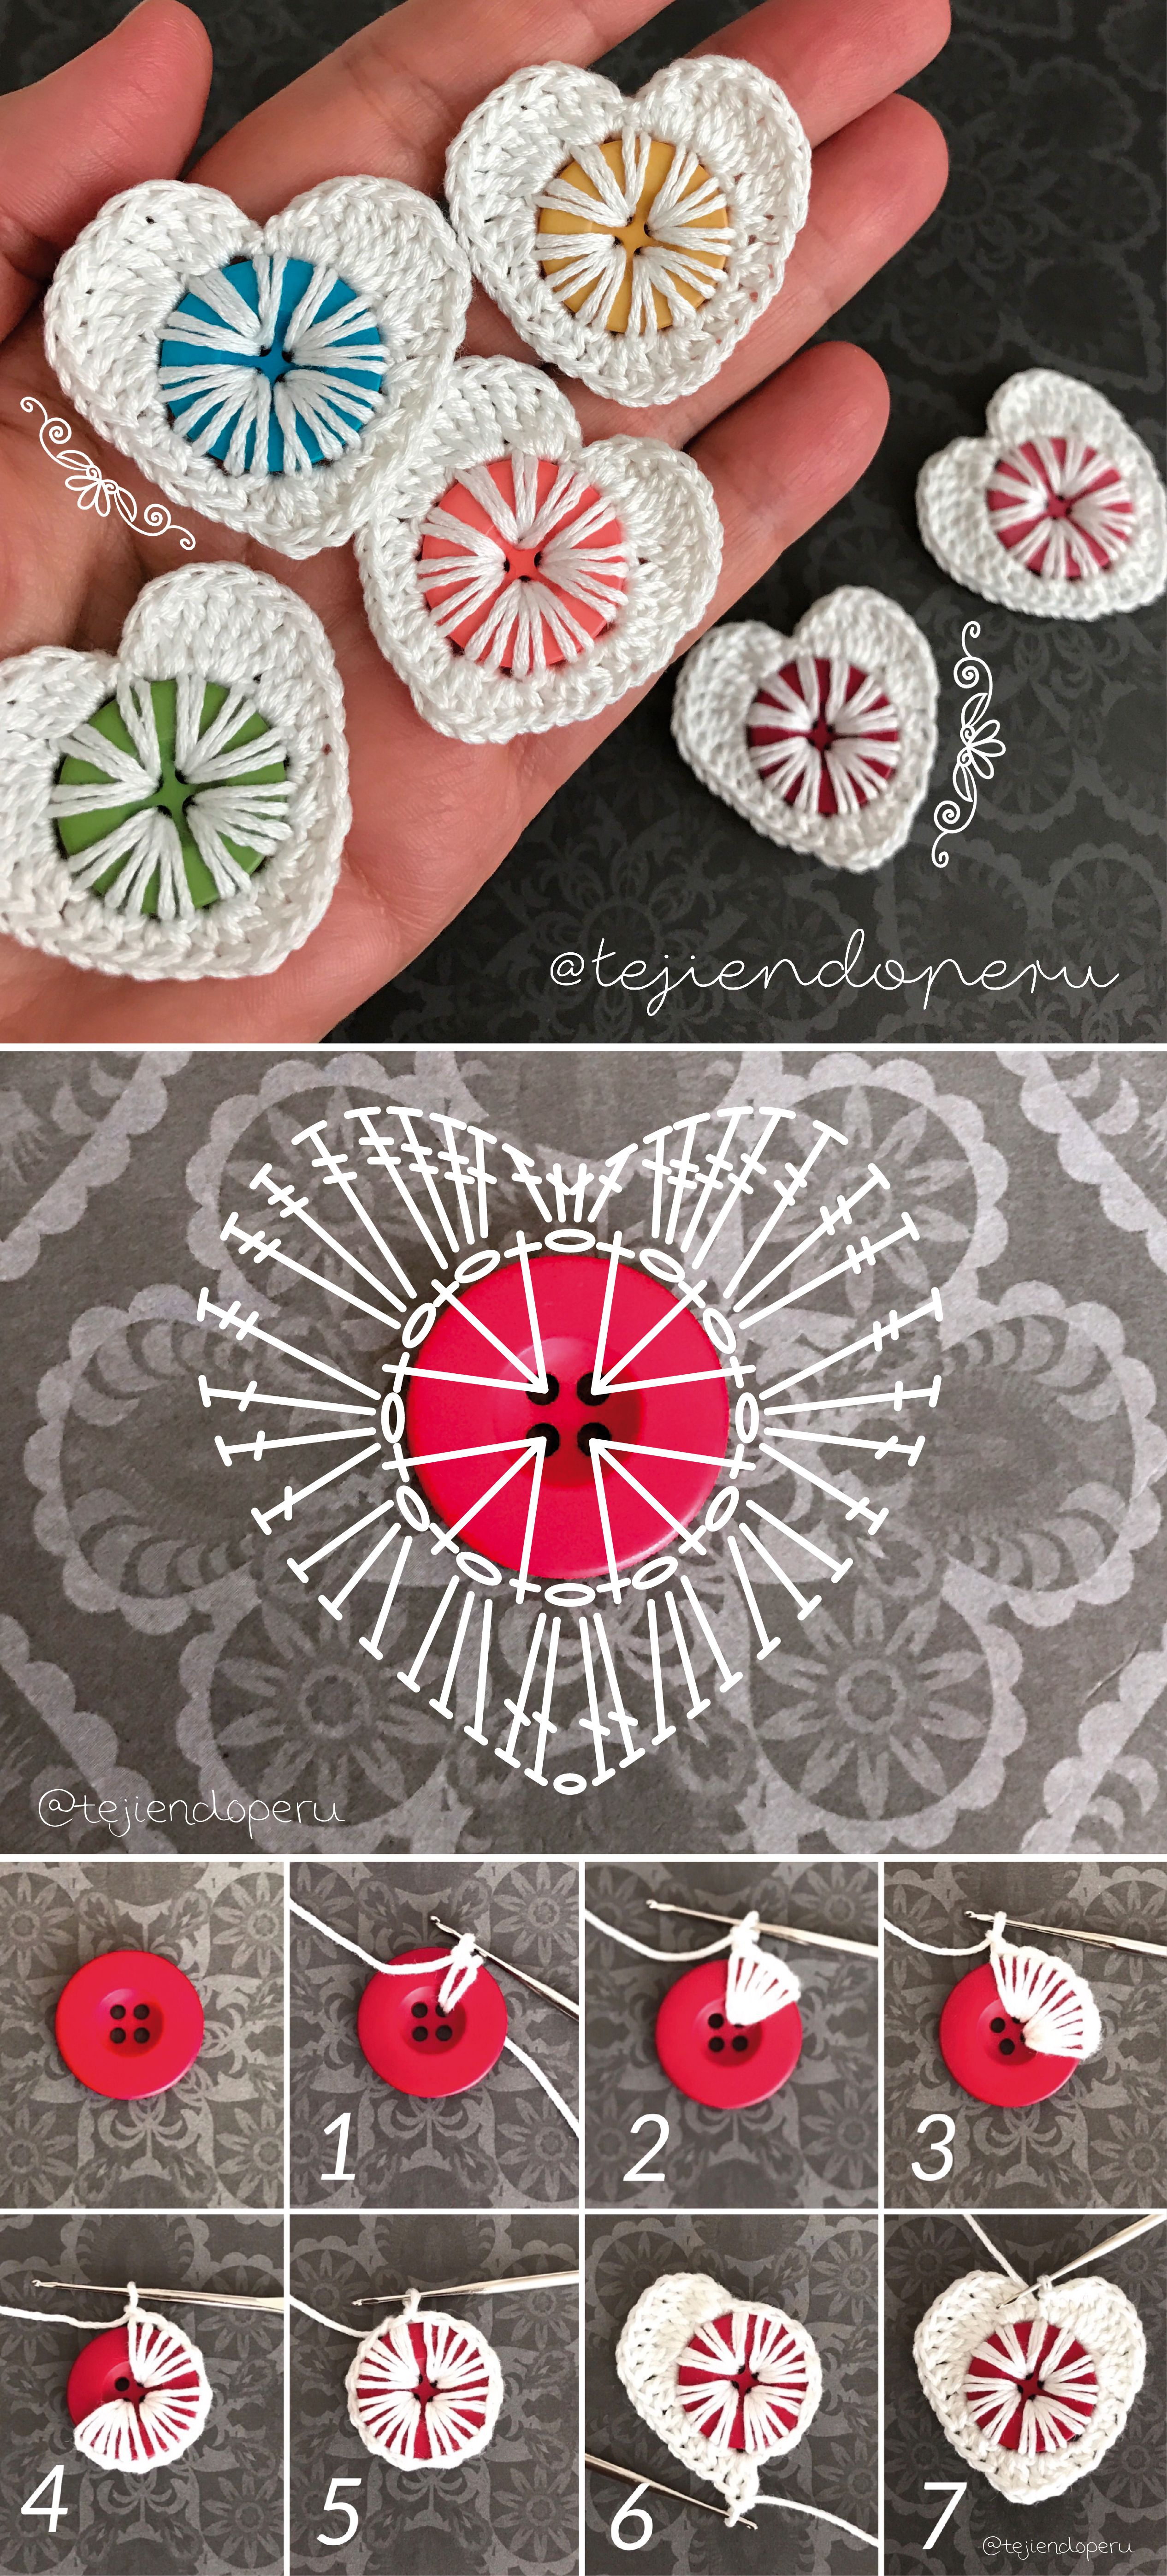 Crochet button hearts <3 Valentine's crochet! Corazones tejidos a crochet en un botón!